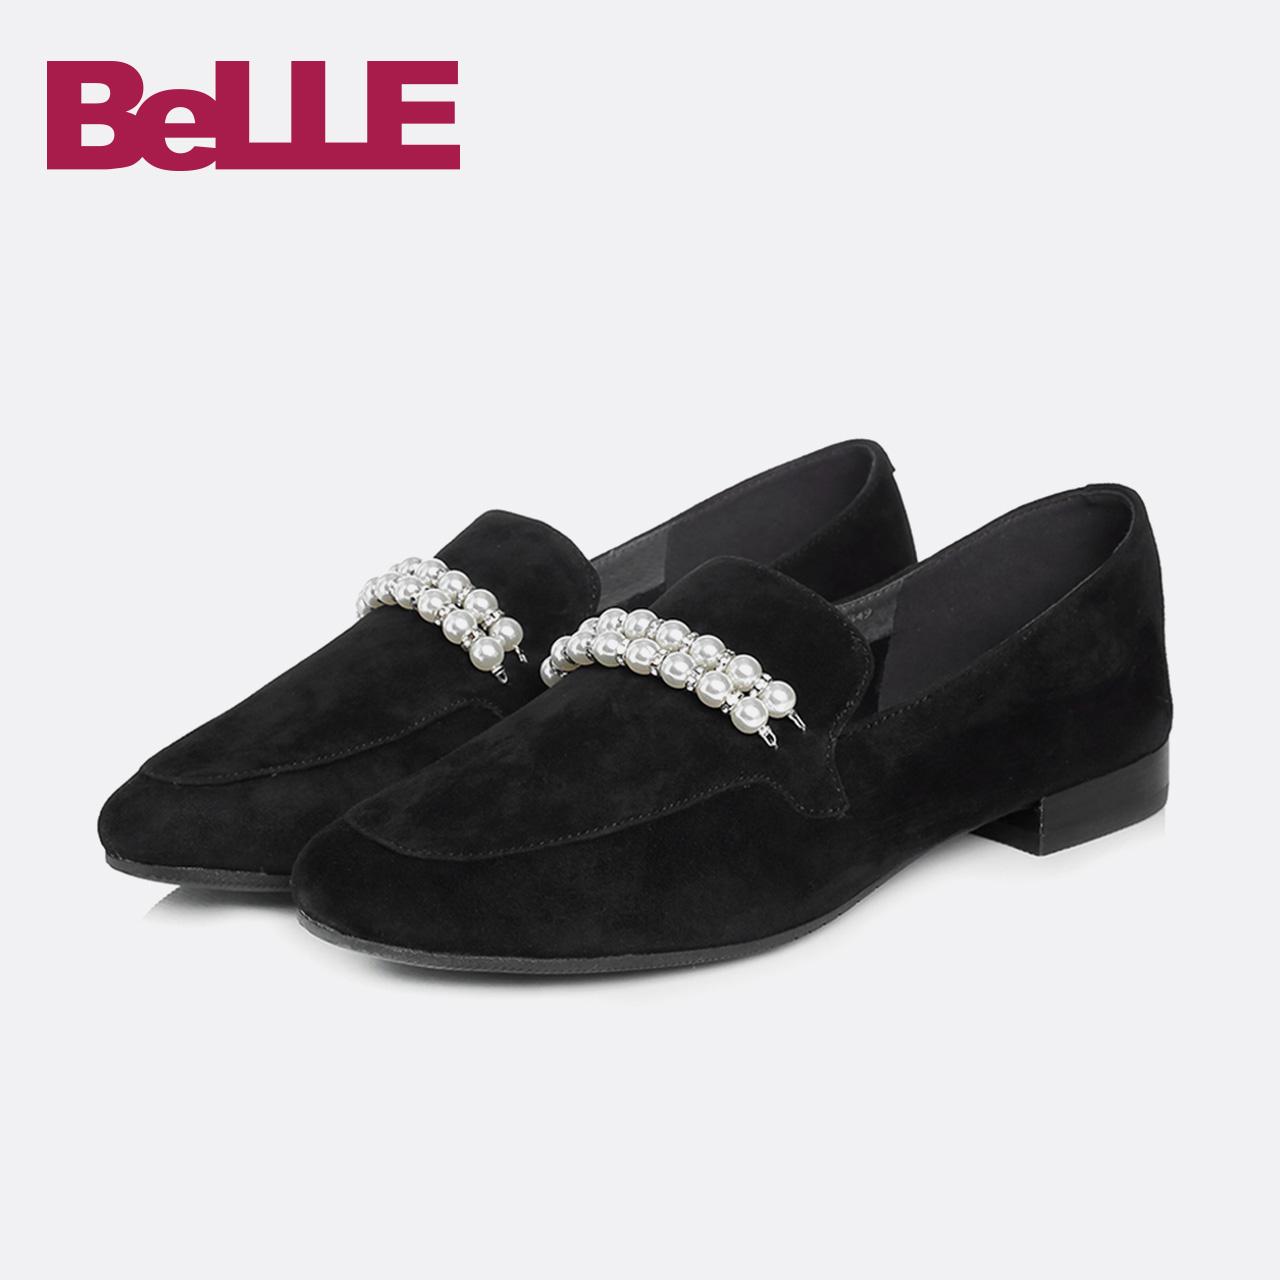 Belle-百丽2018春新款商场同款羊绒皮女单鞋乐福鞋BPZB2AM8